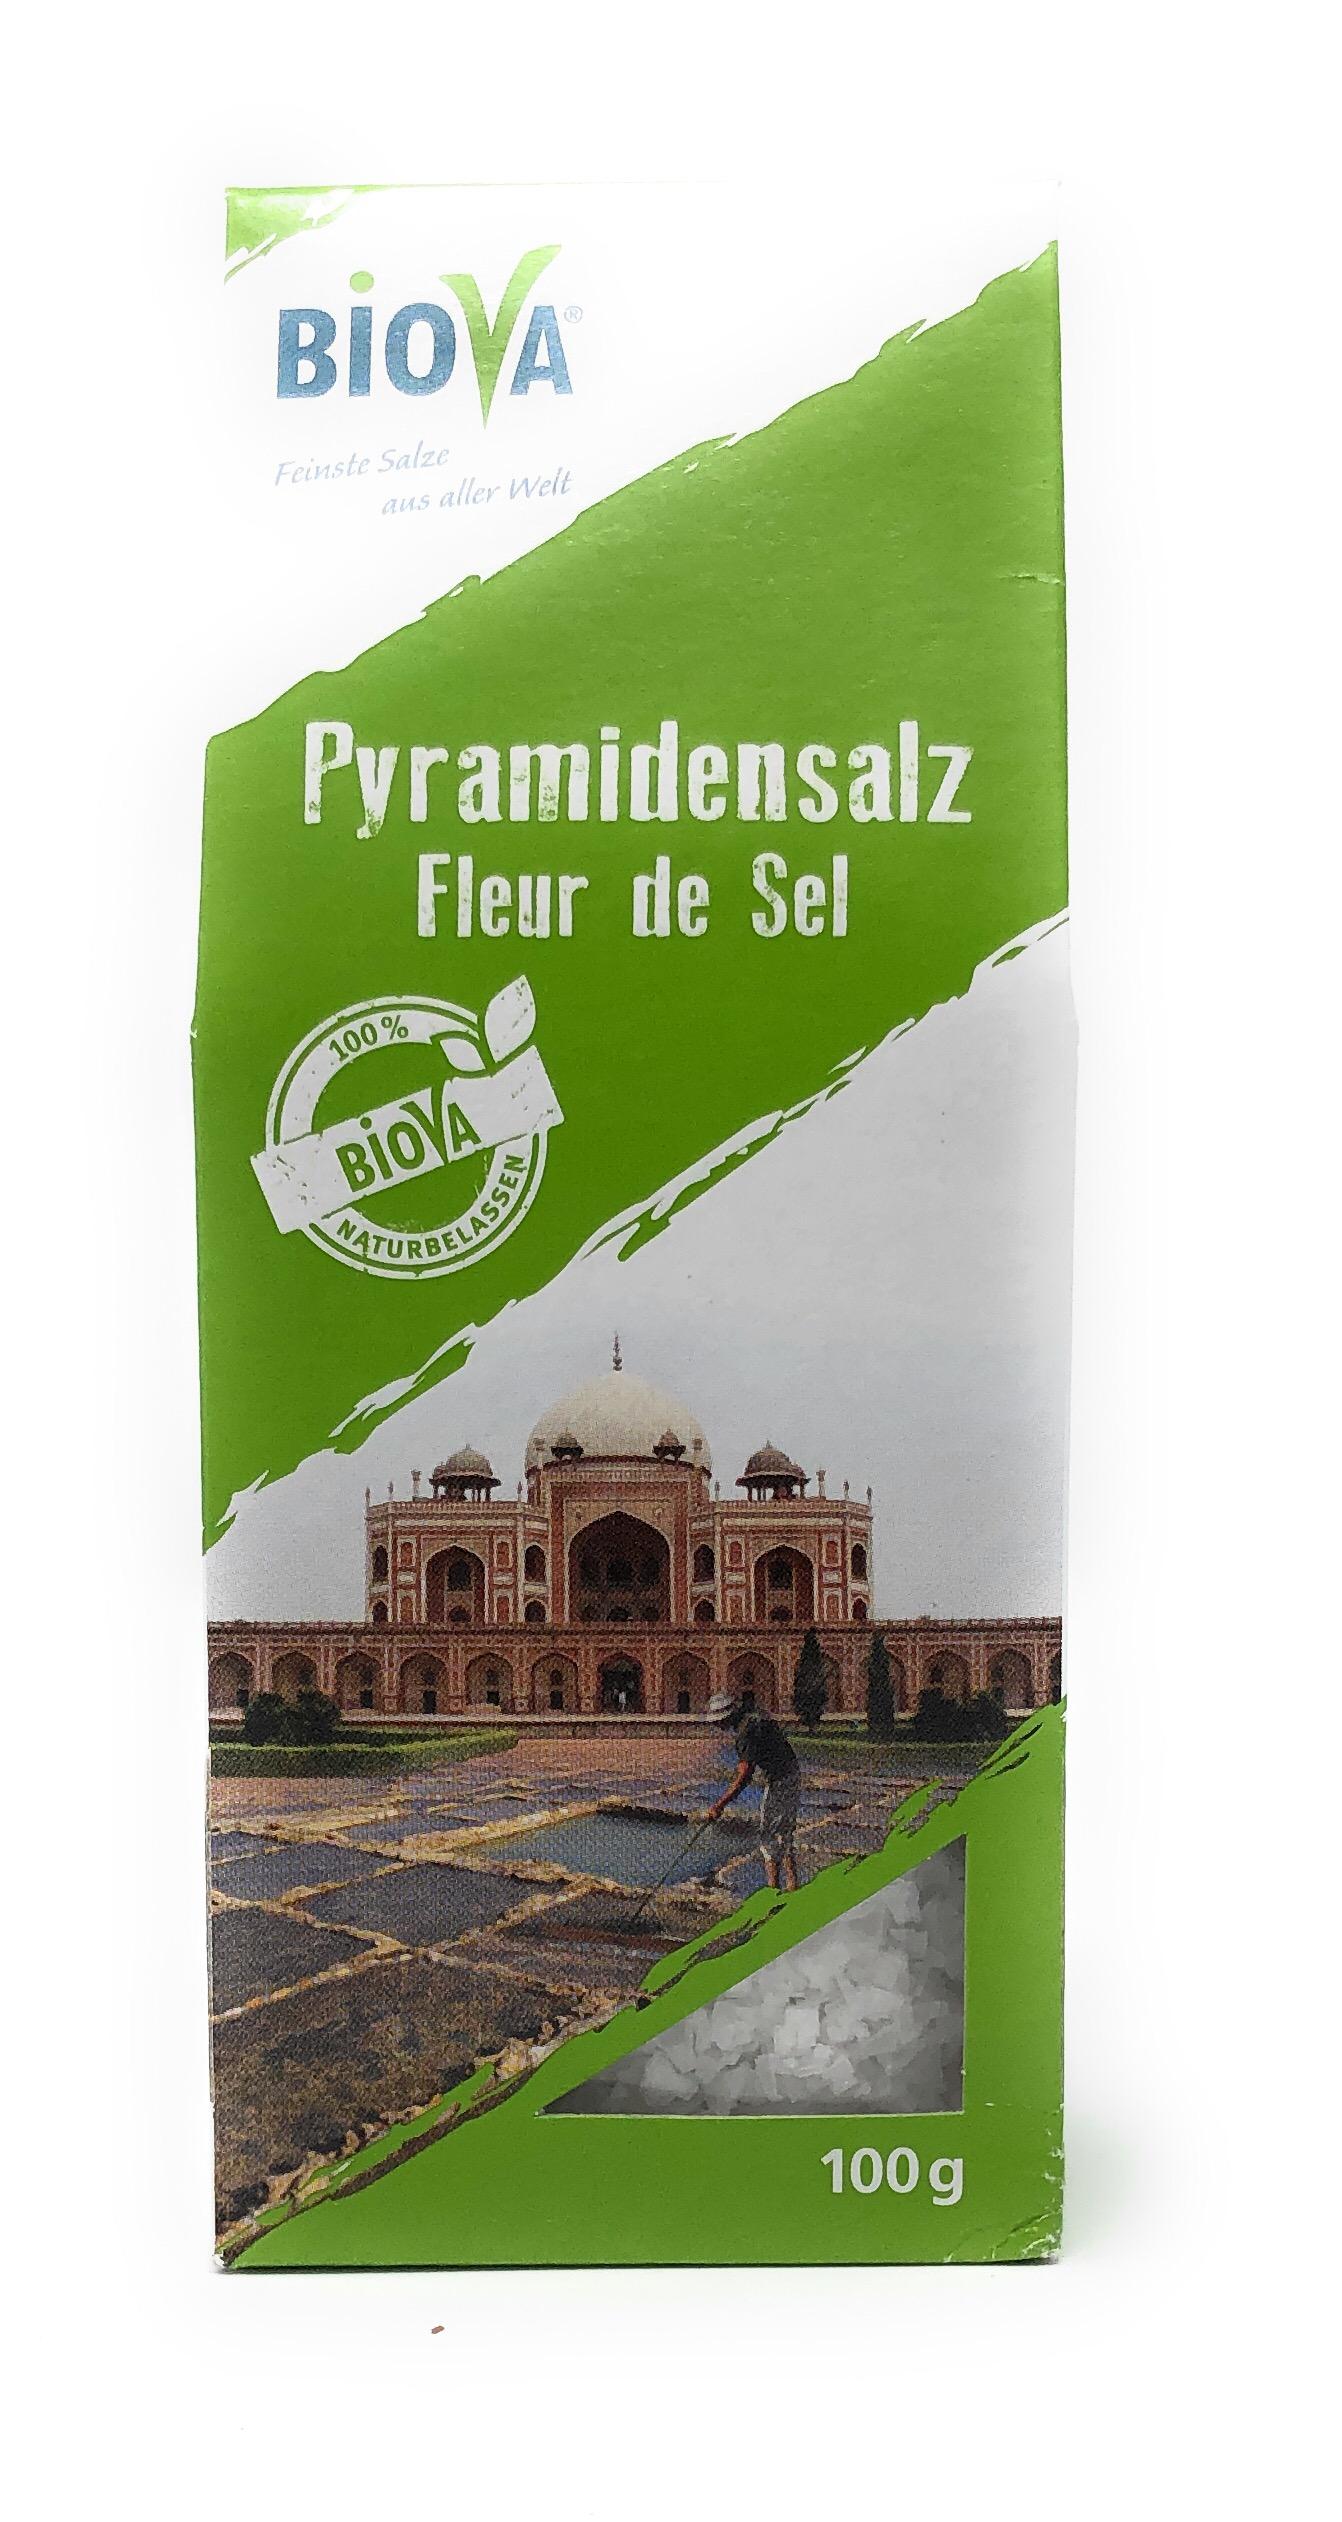 Biova Gourmetsalz Pyramidensalz Fleur du Sel aus Indien 2-12mm 100g